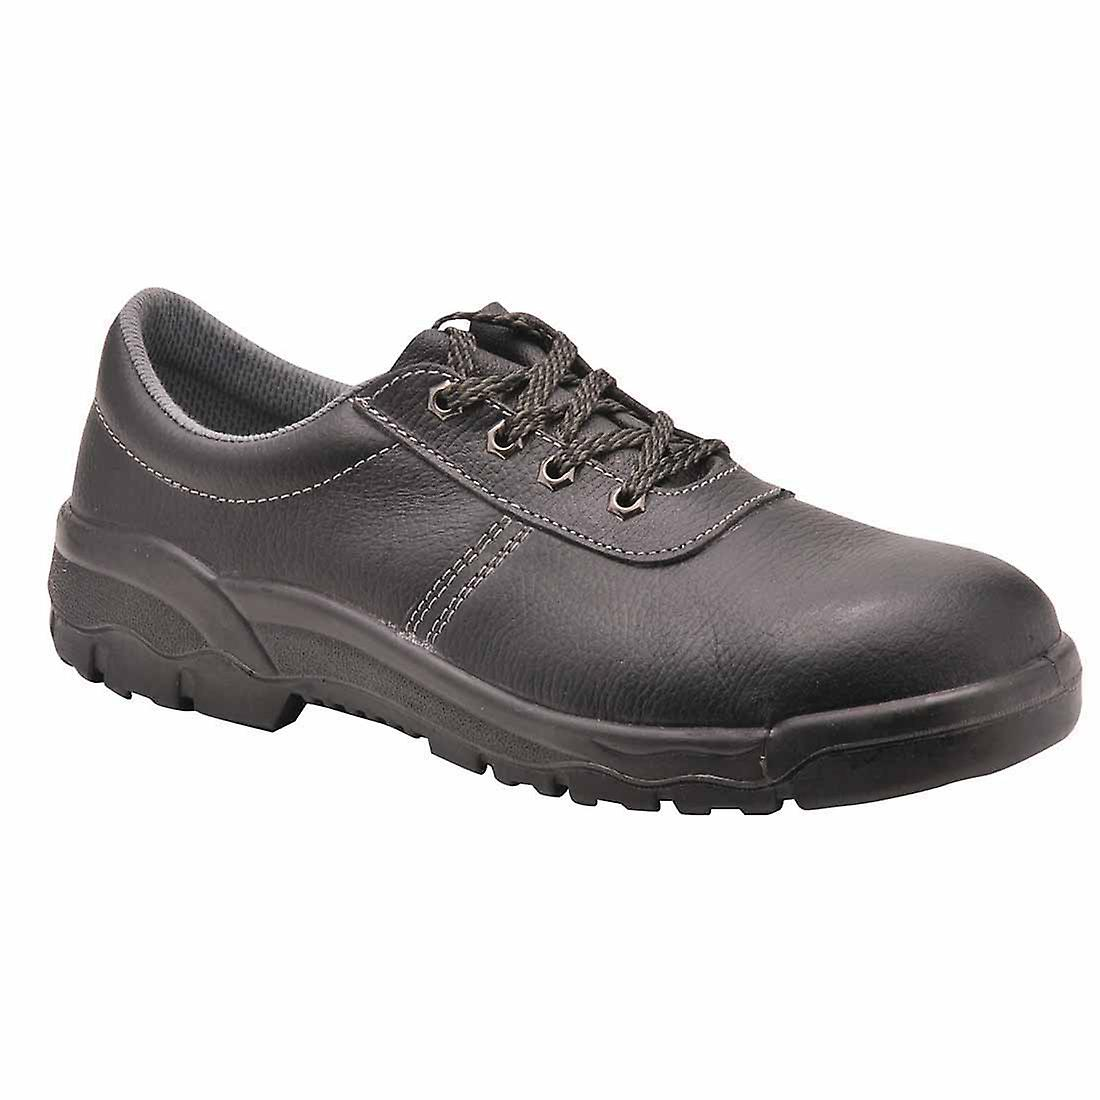 sUw - Steelite Steelite - Kumo Workwear Safety Shoe S3 d5bb5d